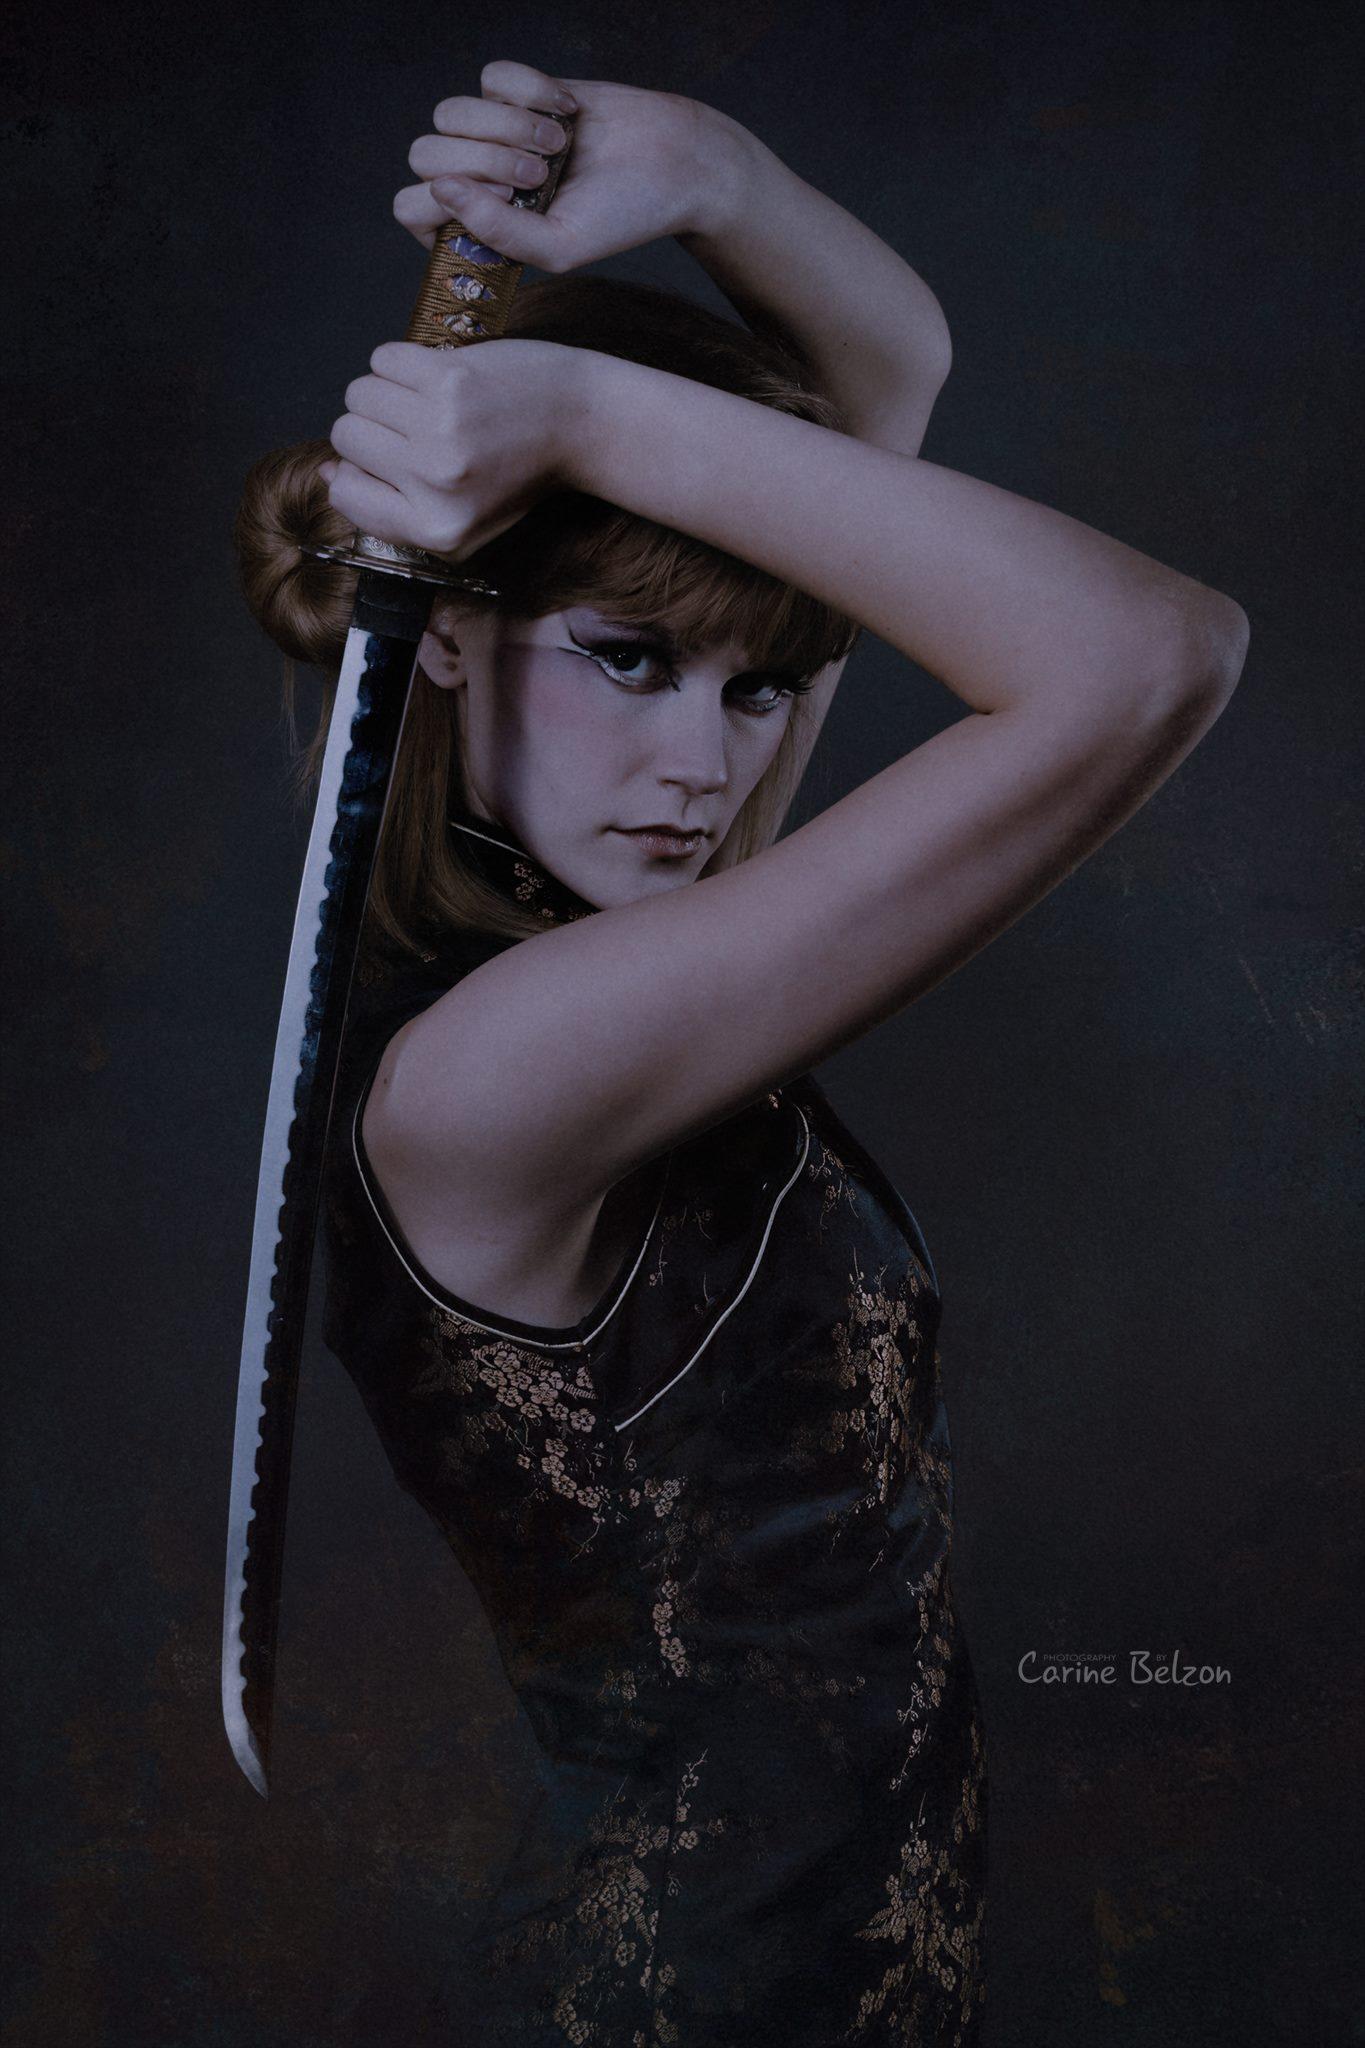 Portfolio - Vrij werk - Thema - Carine Belzon Fotografie